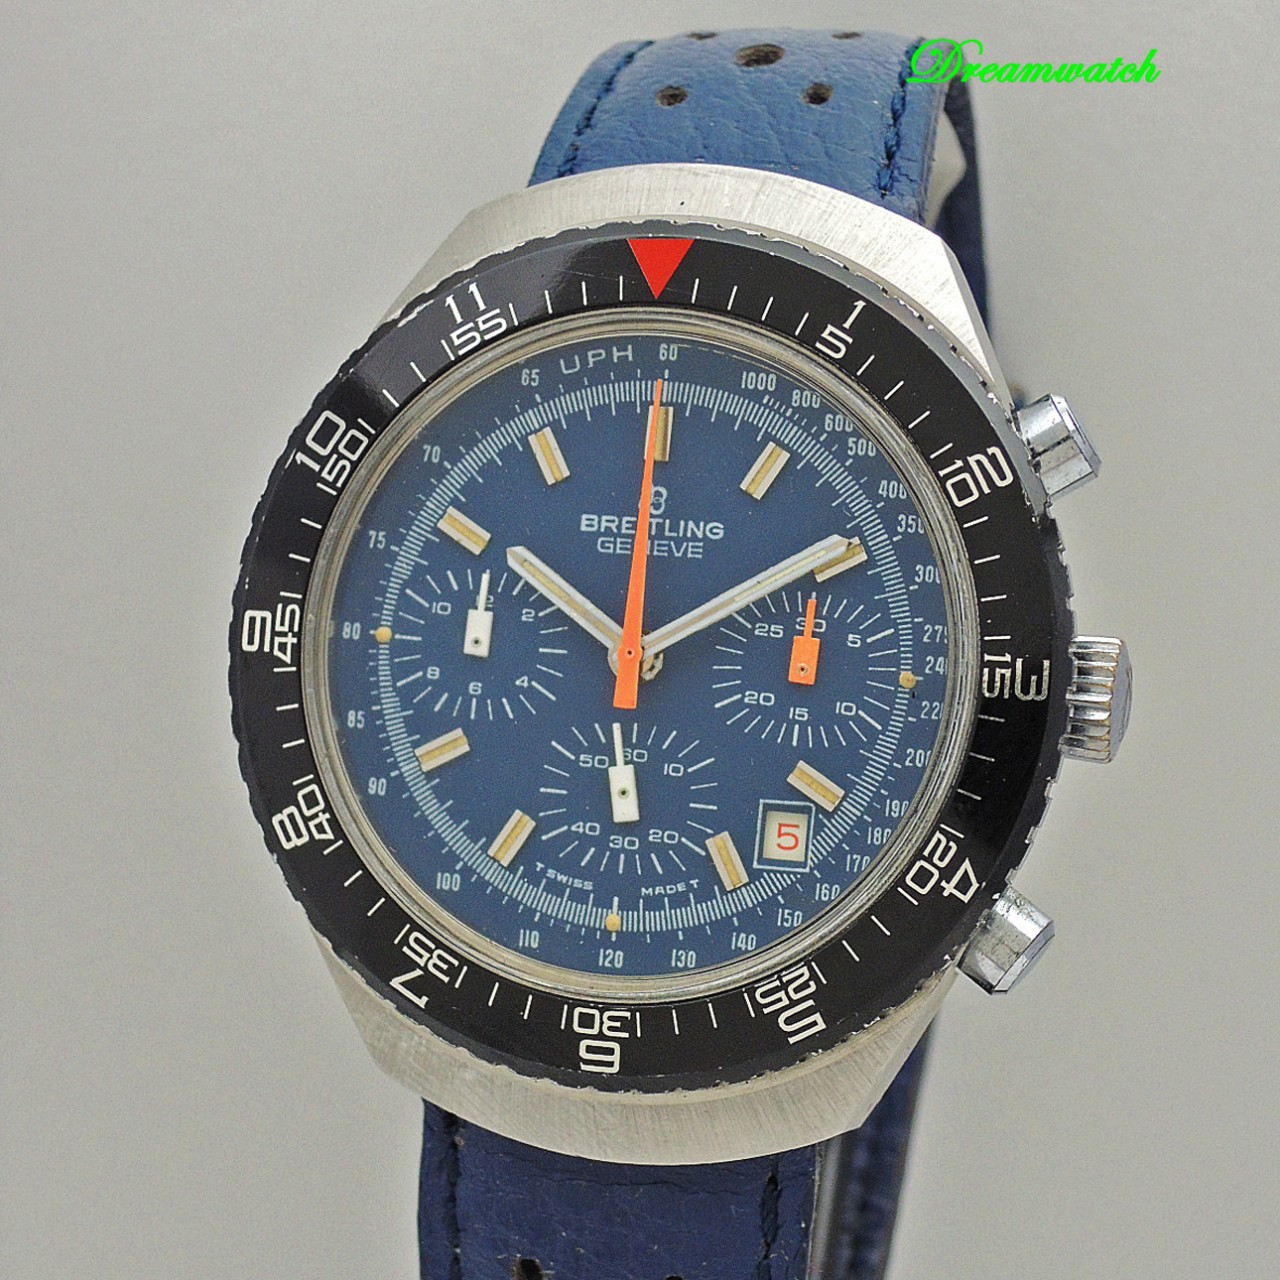 Breitling Vintage Chronograph 7104 -Cal. 7740 very rare